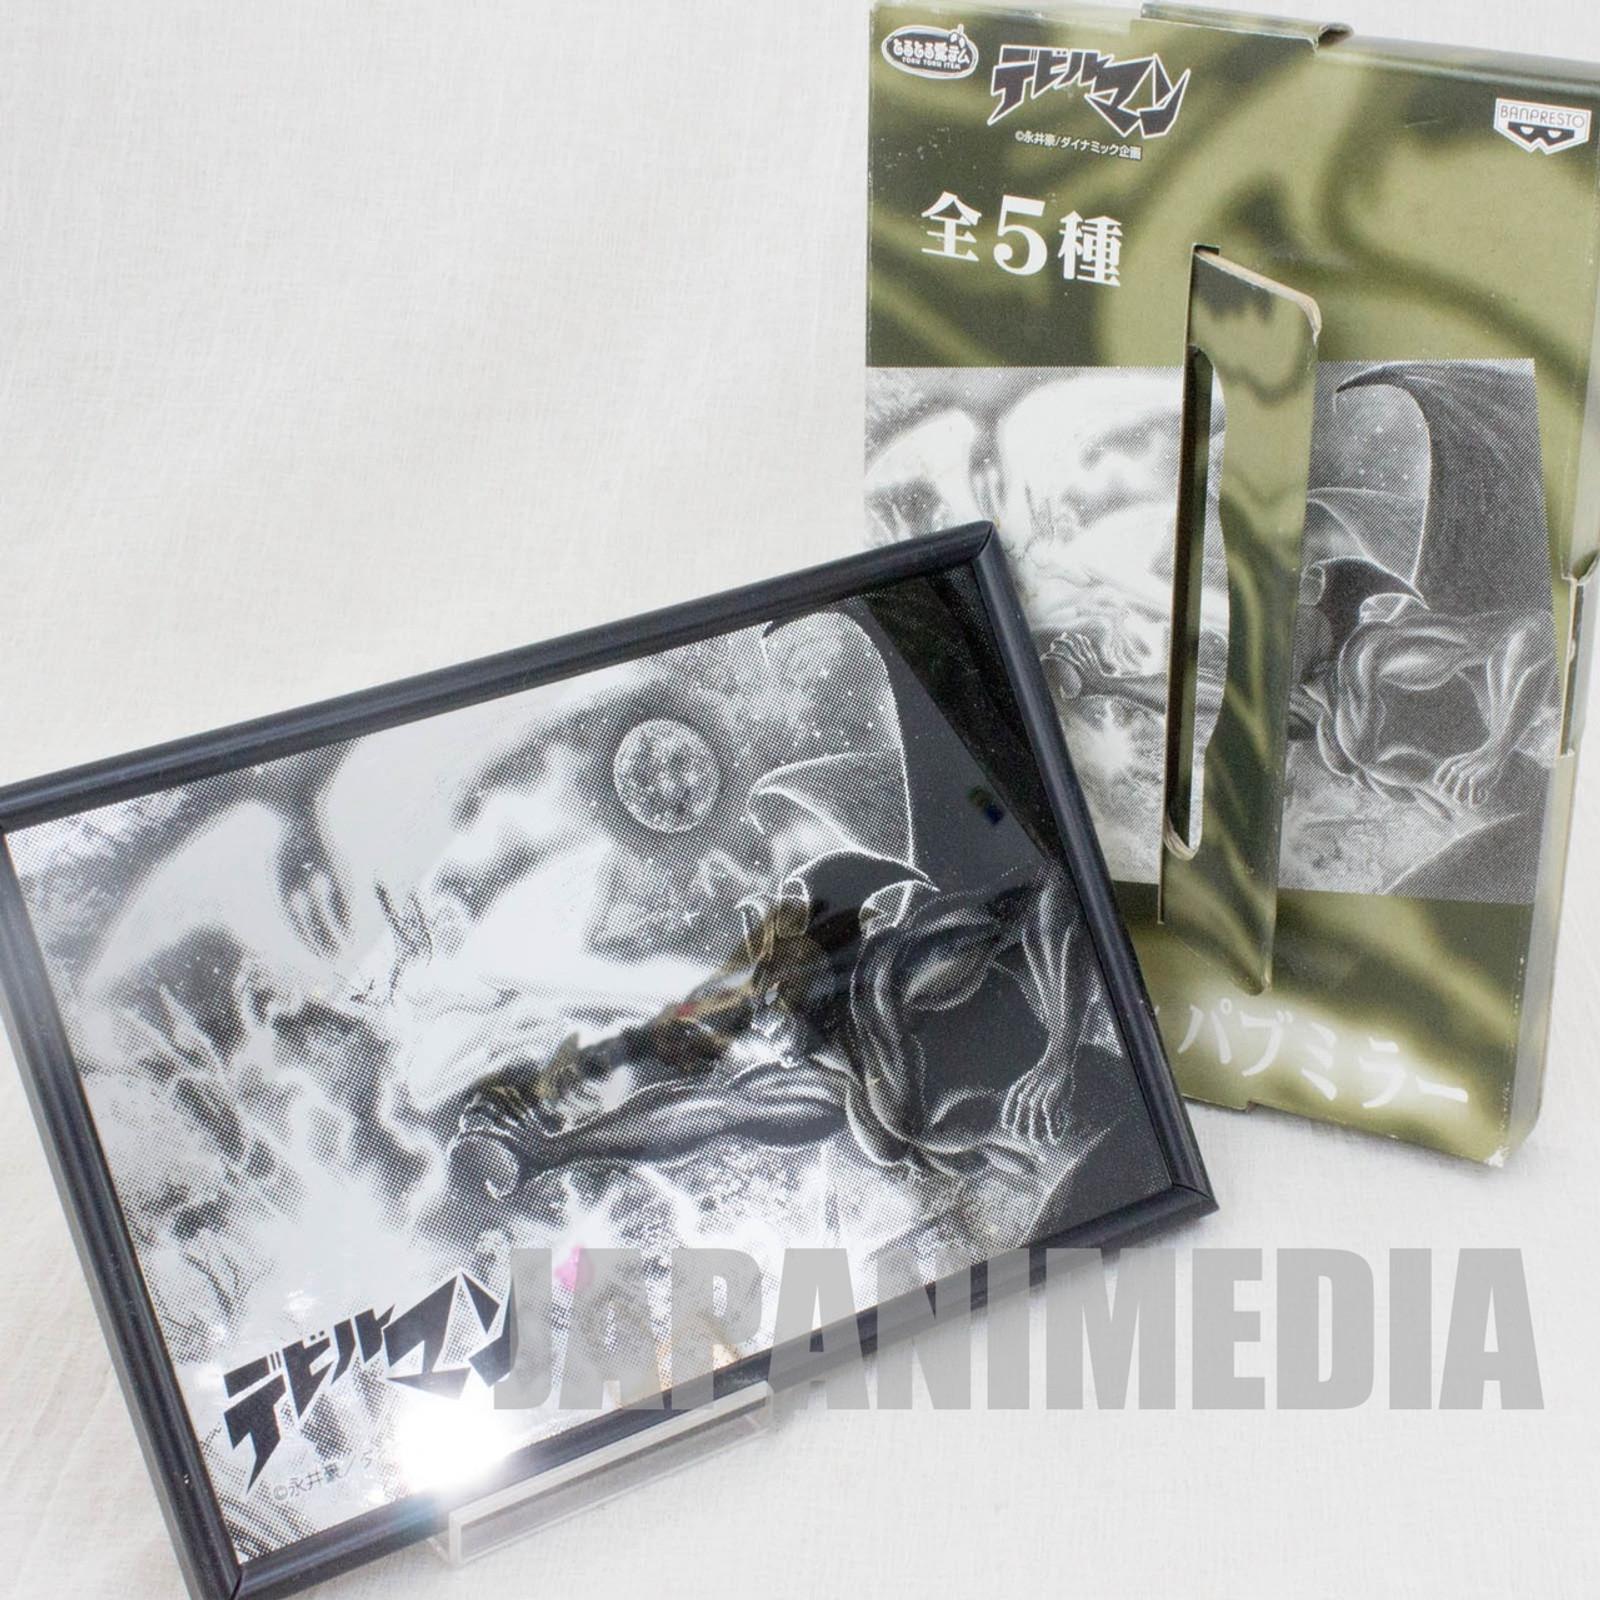 Devilman Desktop Picture Mirror Comic Ver. Go Nagai JAPAN ANIME MANGA 2